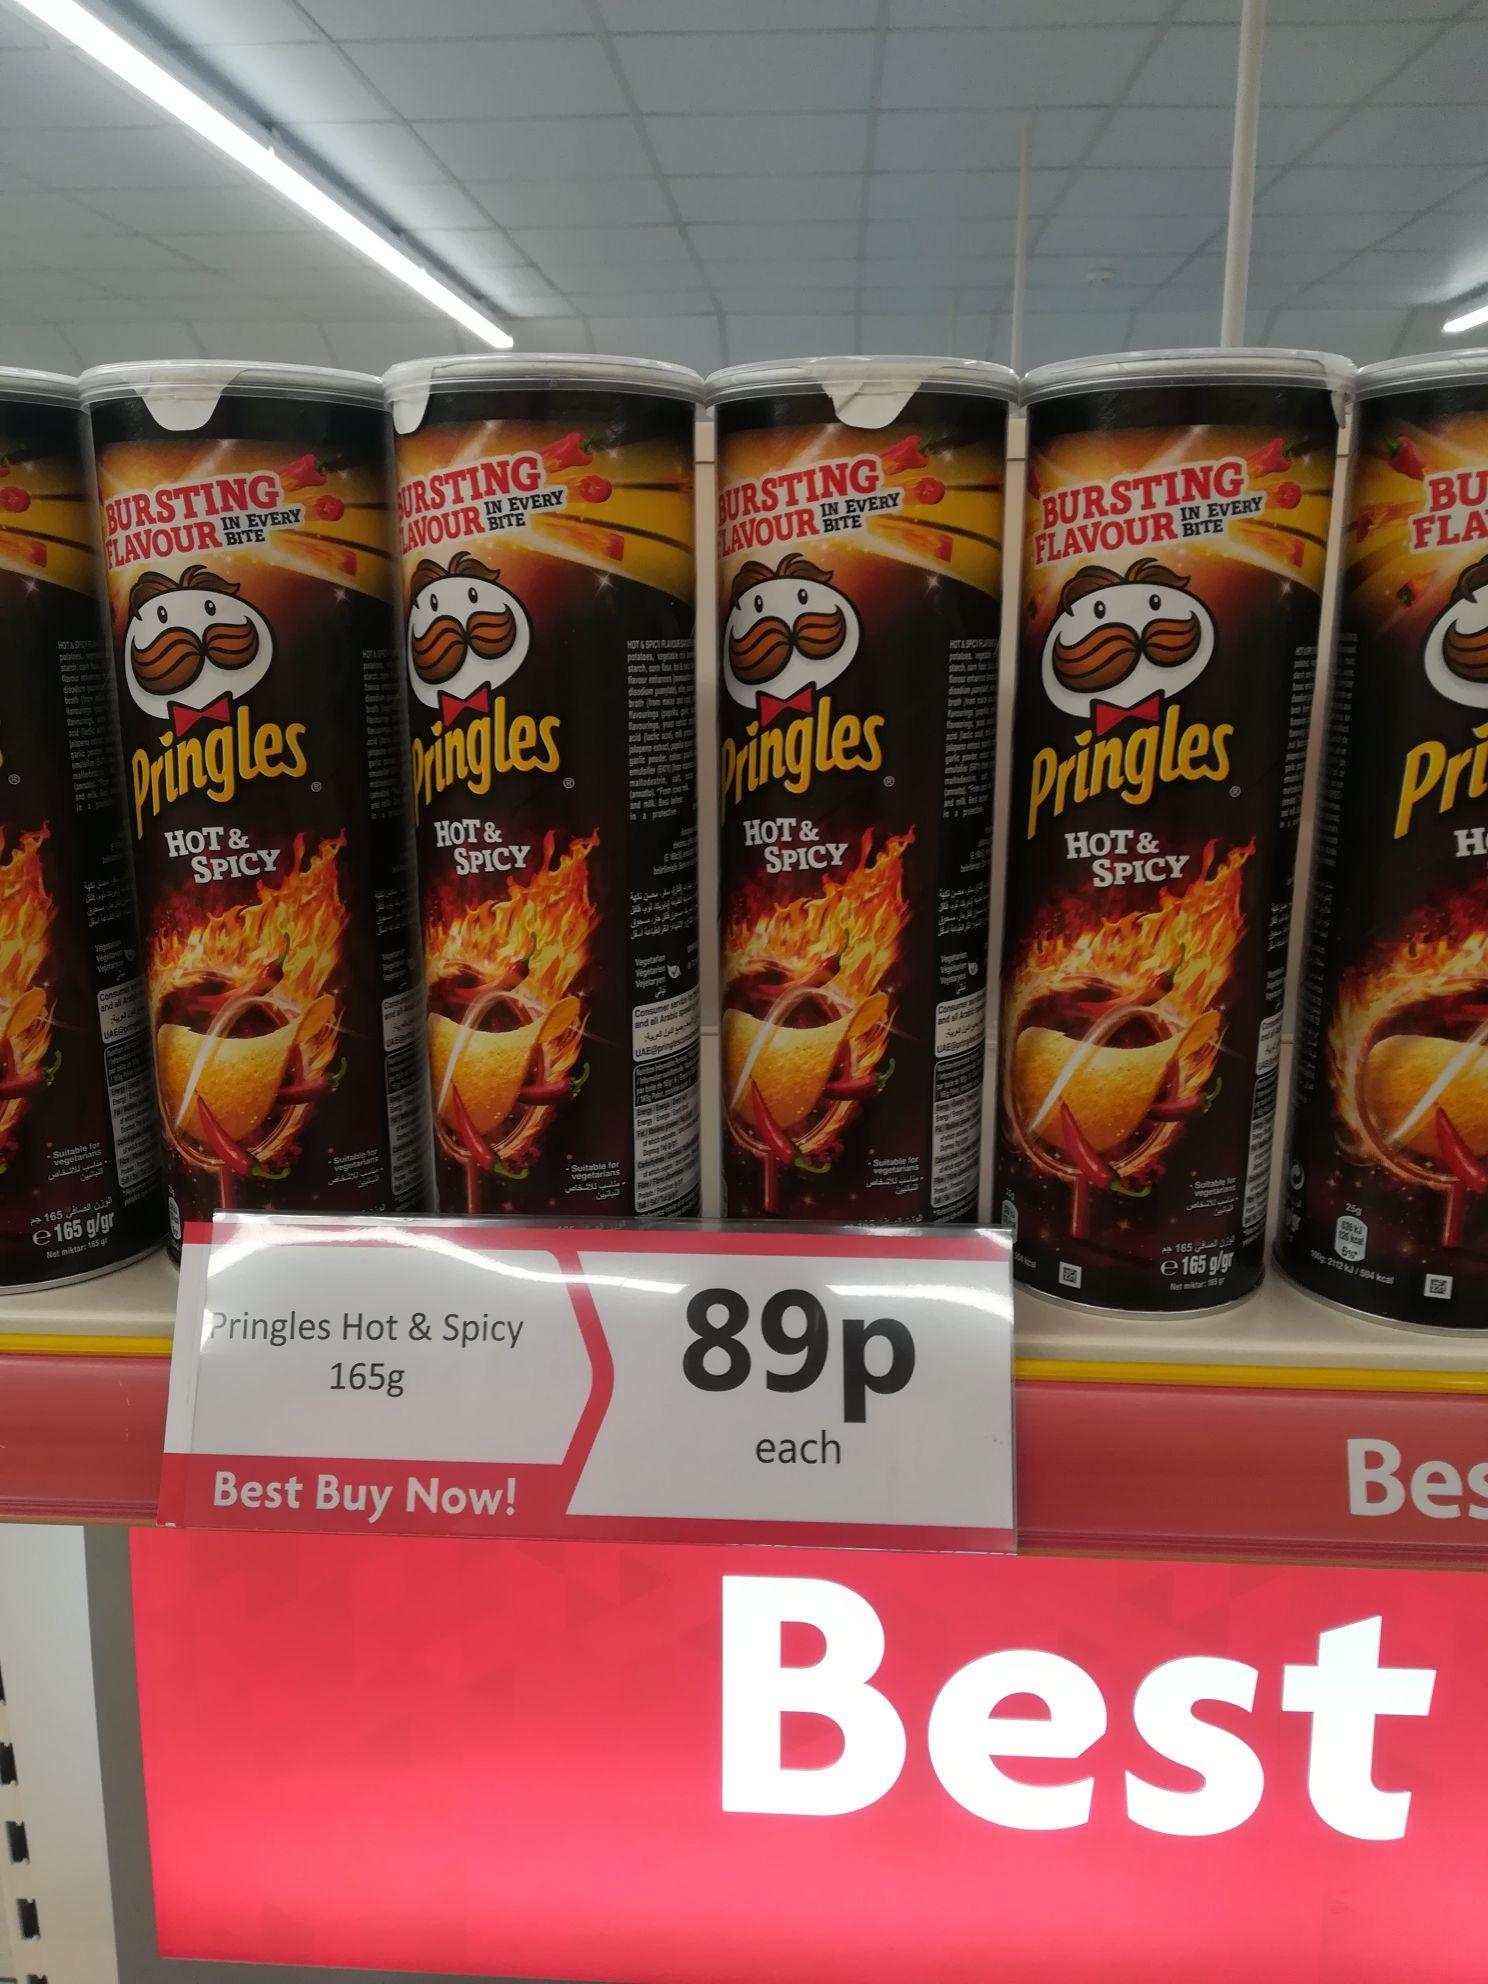 Pringles hot & spicy @ heron 89p